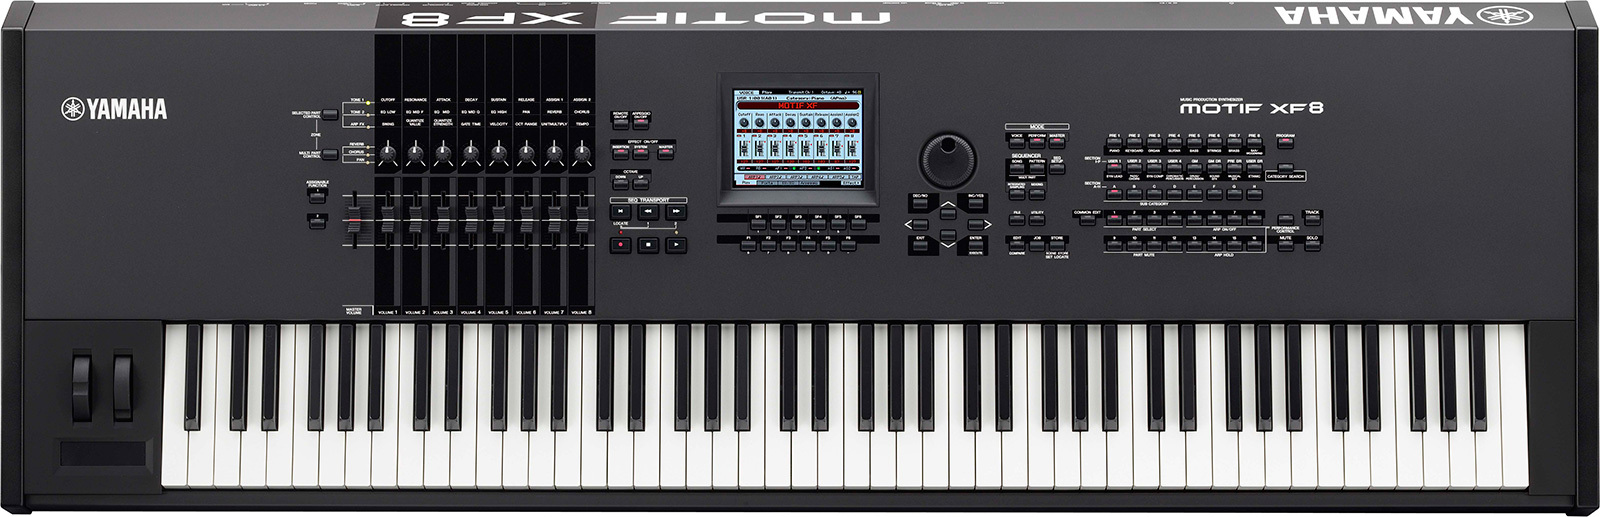 32 audio demos of yamaha motif xf8 audiofanzine for Yamaha motif keyboard